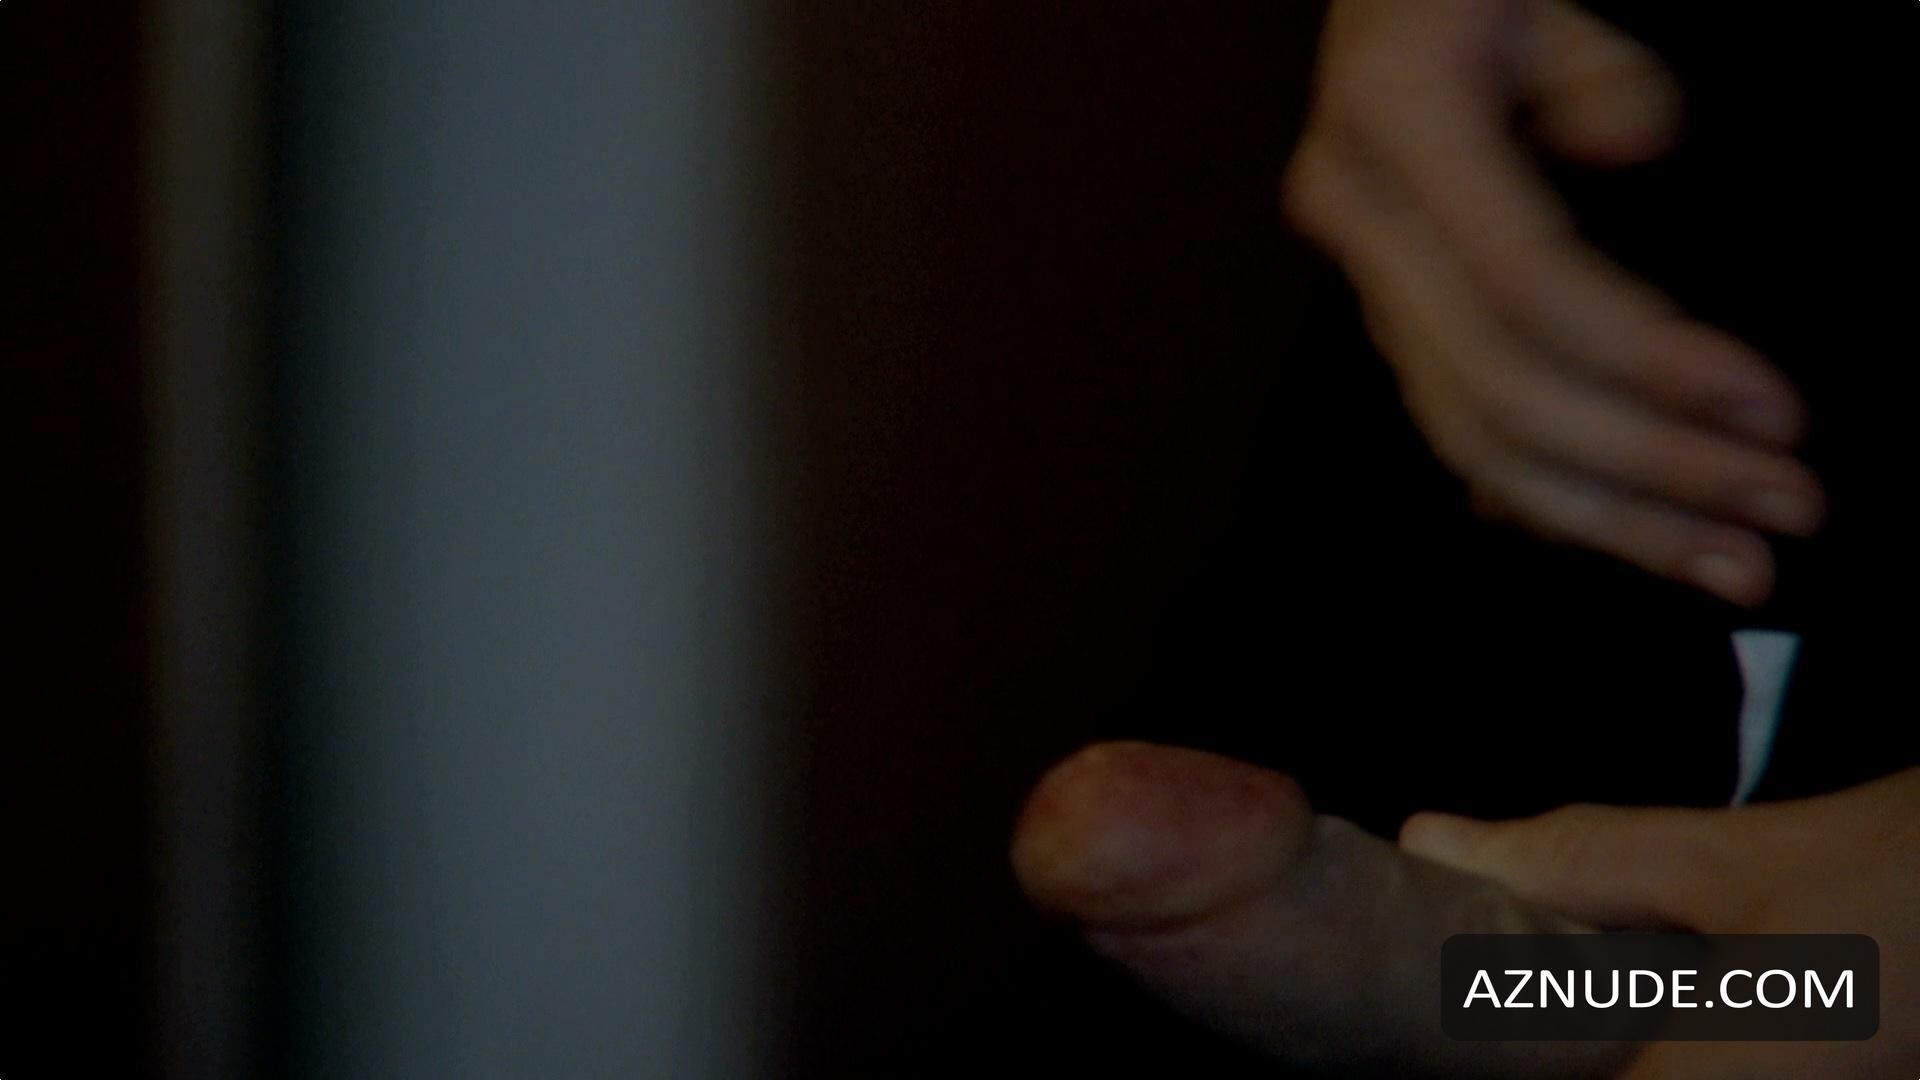 Superstar Balthazar Getty Nude Pics Pics